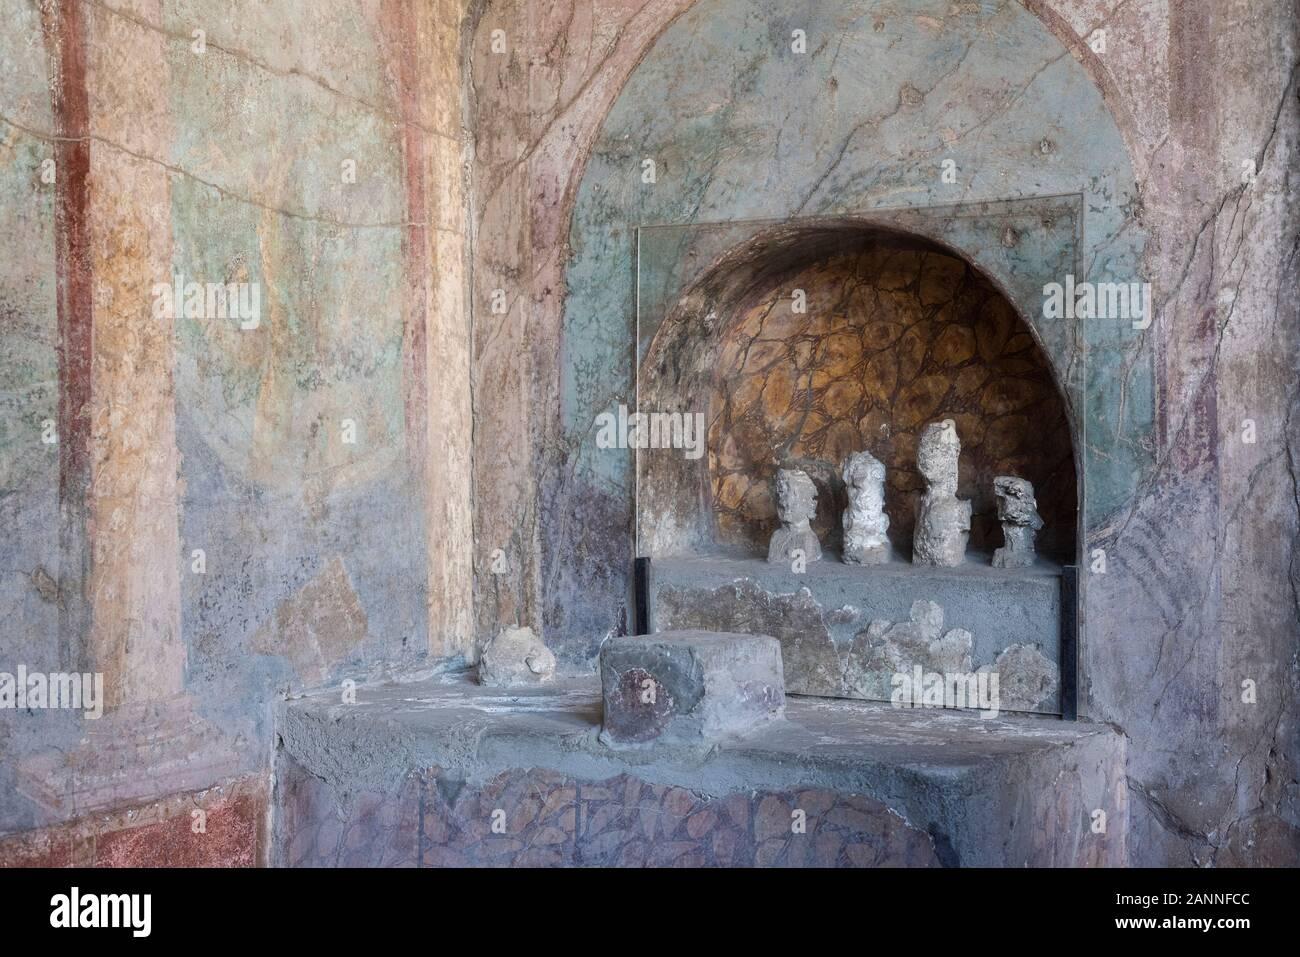 Pompei. Italia. Sitio arqueológico de Pompeya. Casa de MENANDER (Casa del Menandro). Lararium (santuario de los espíritus de la familia romana) Foto de stock